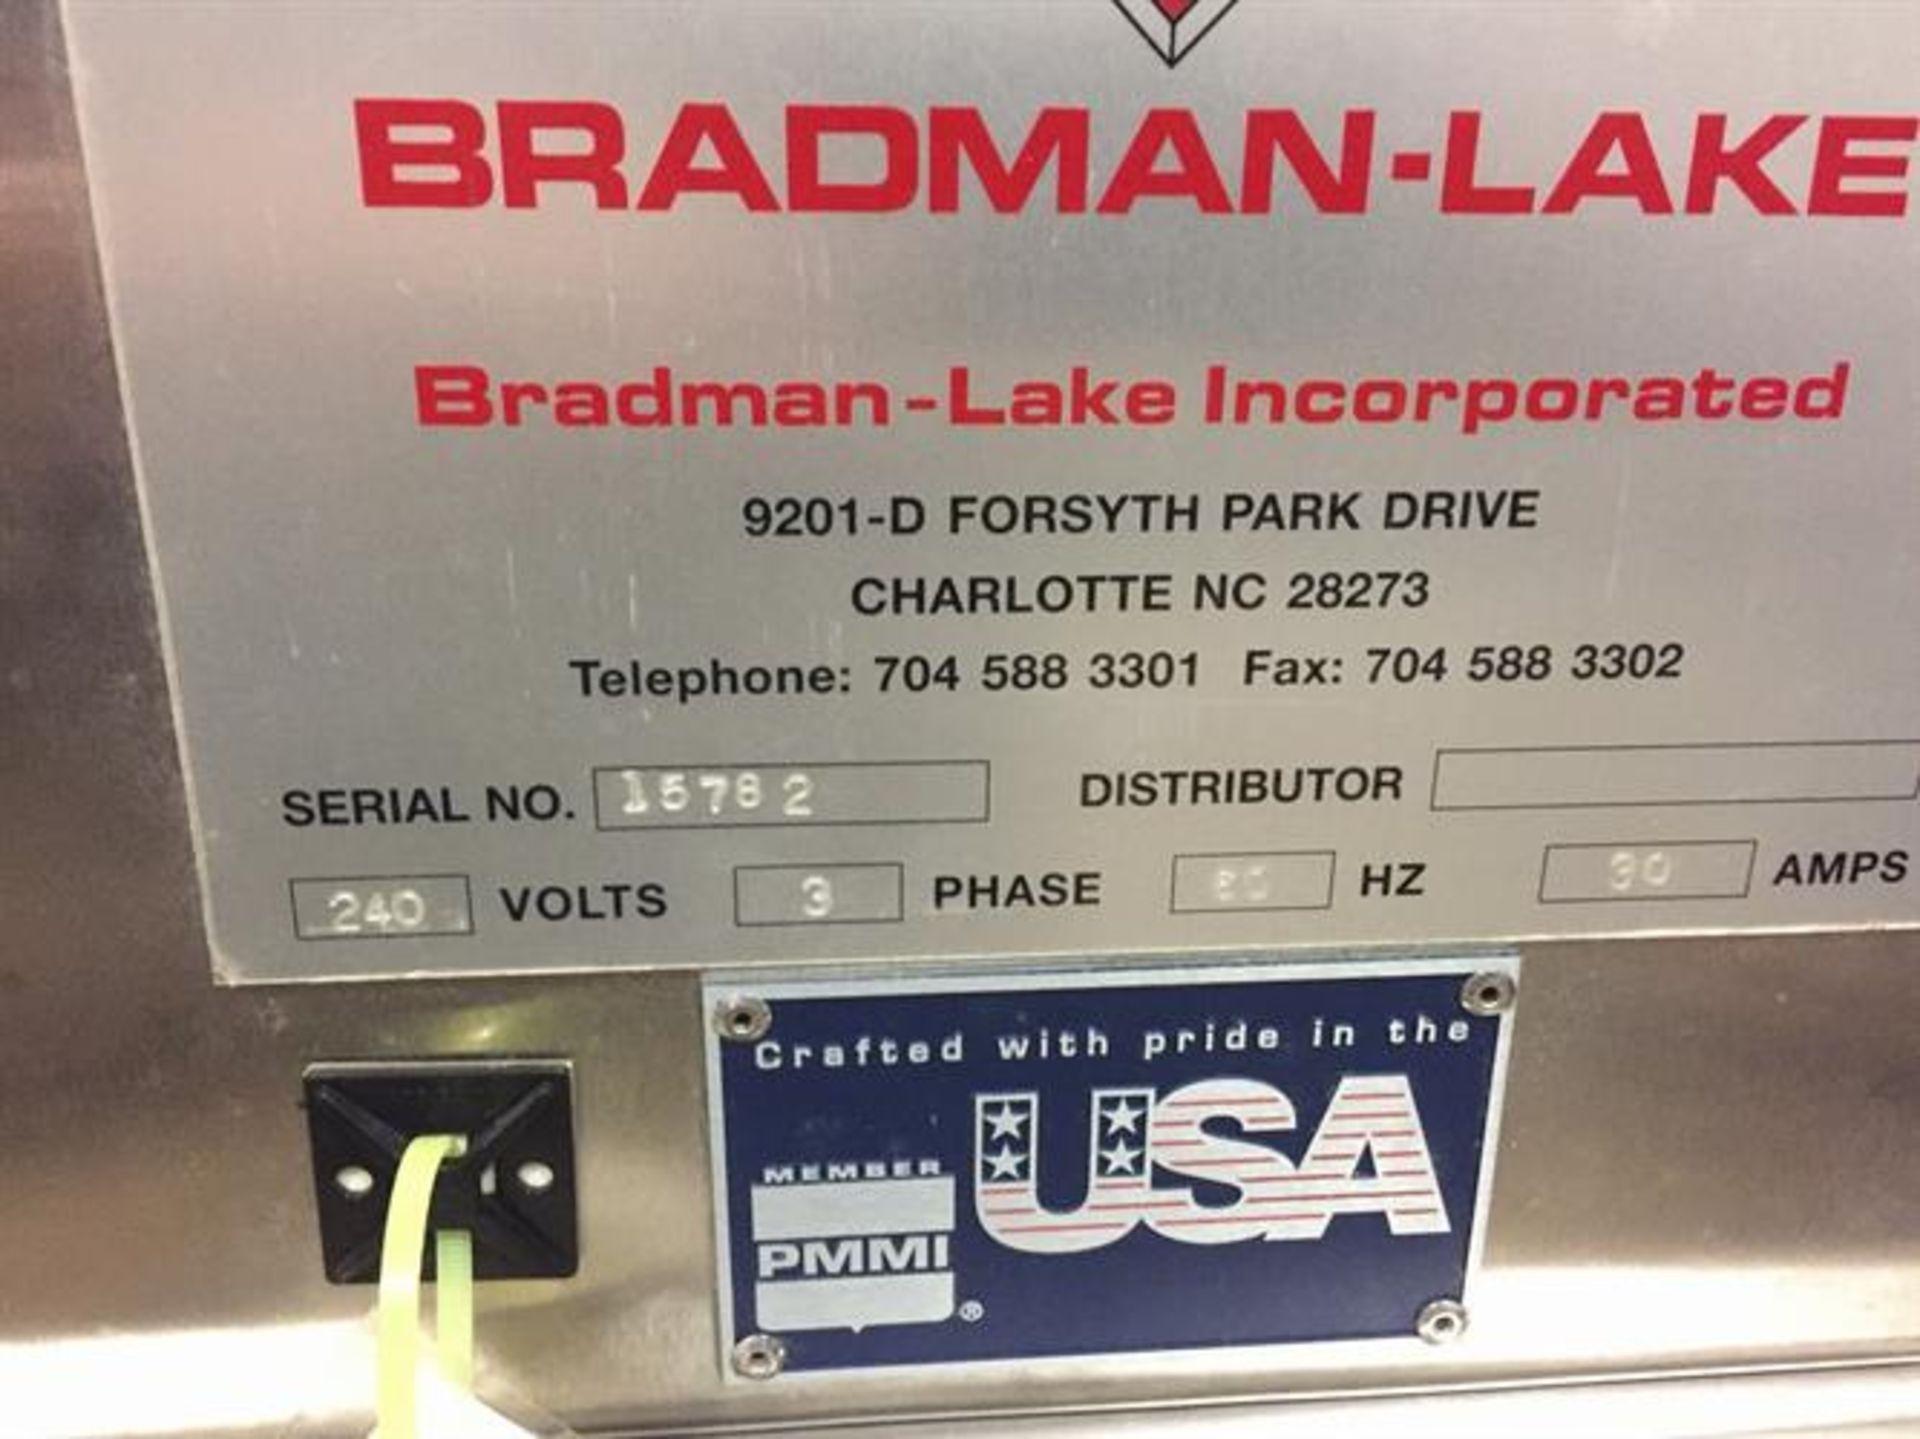 Bradman Lake inline Top Flap Sealer carton closer - Nordson Hot Melt - Allen Bradley Panelview - Image 15 of 19